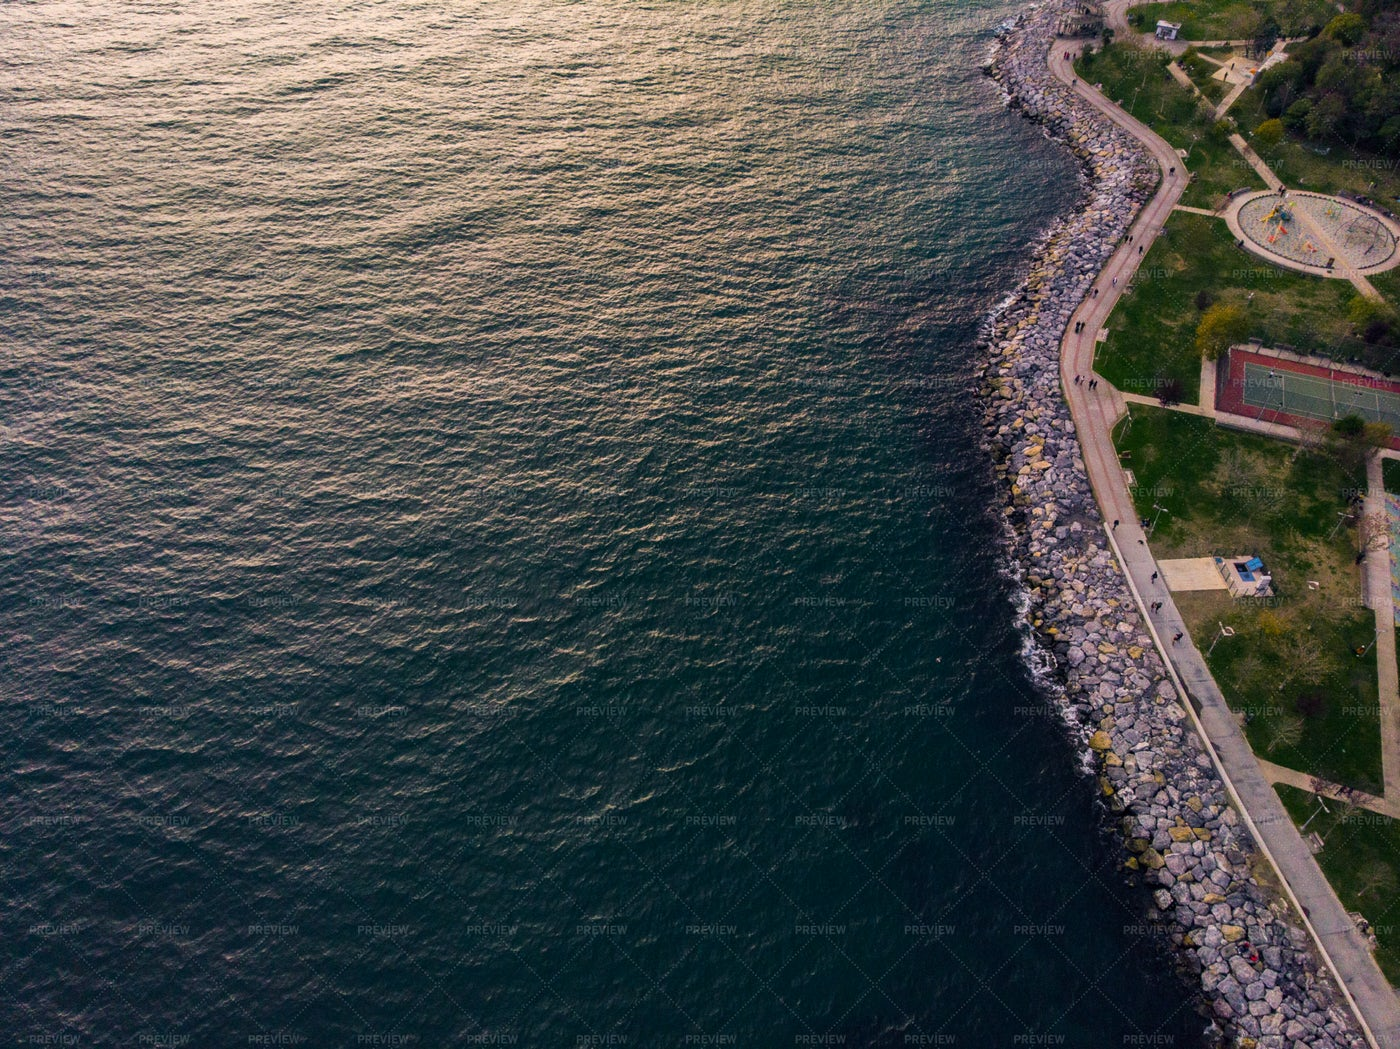 Shore And Ocean Aerial View: Stock Photos